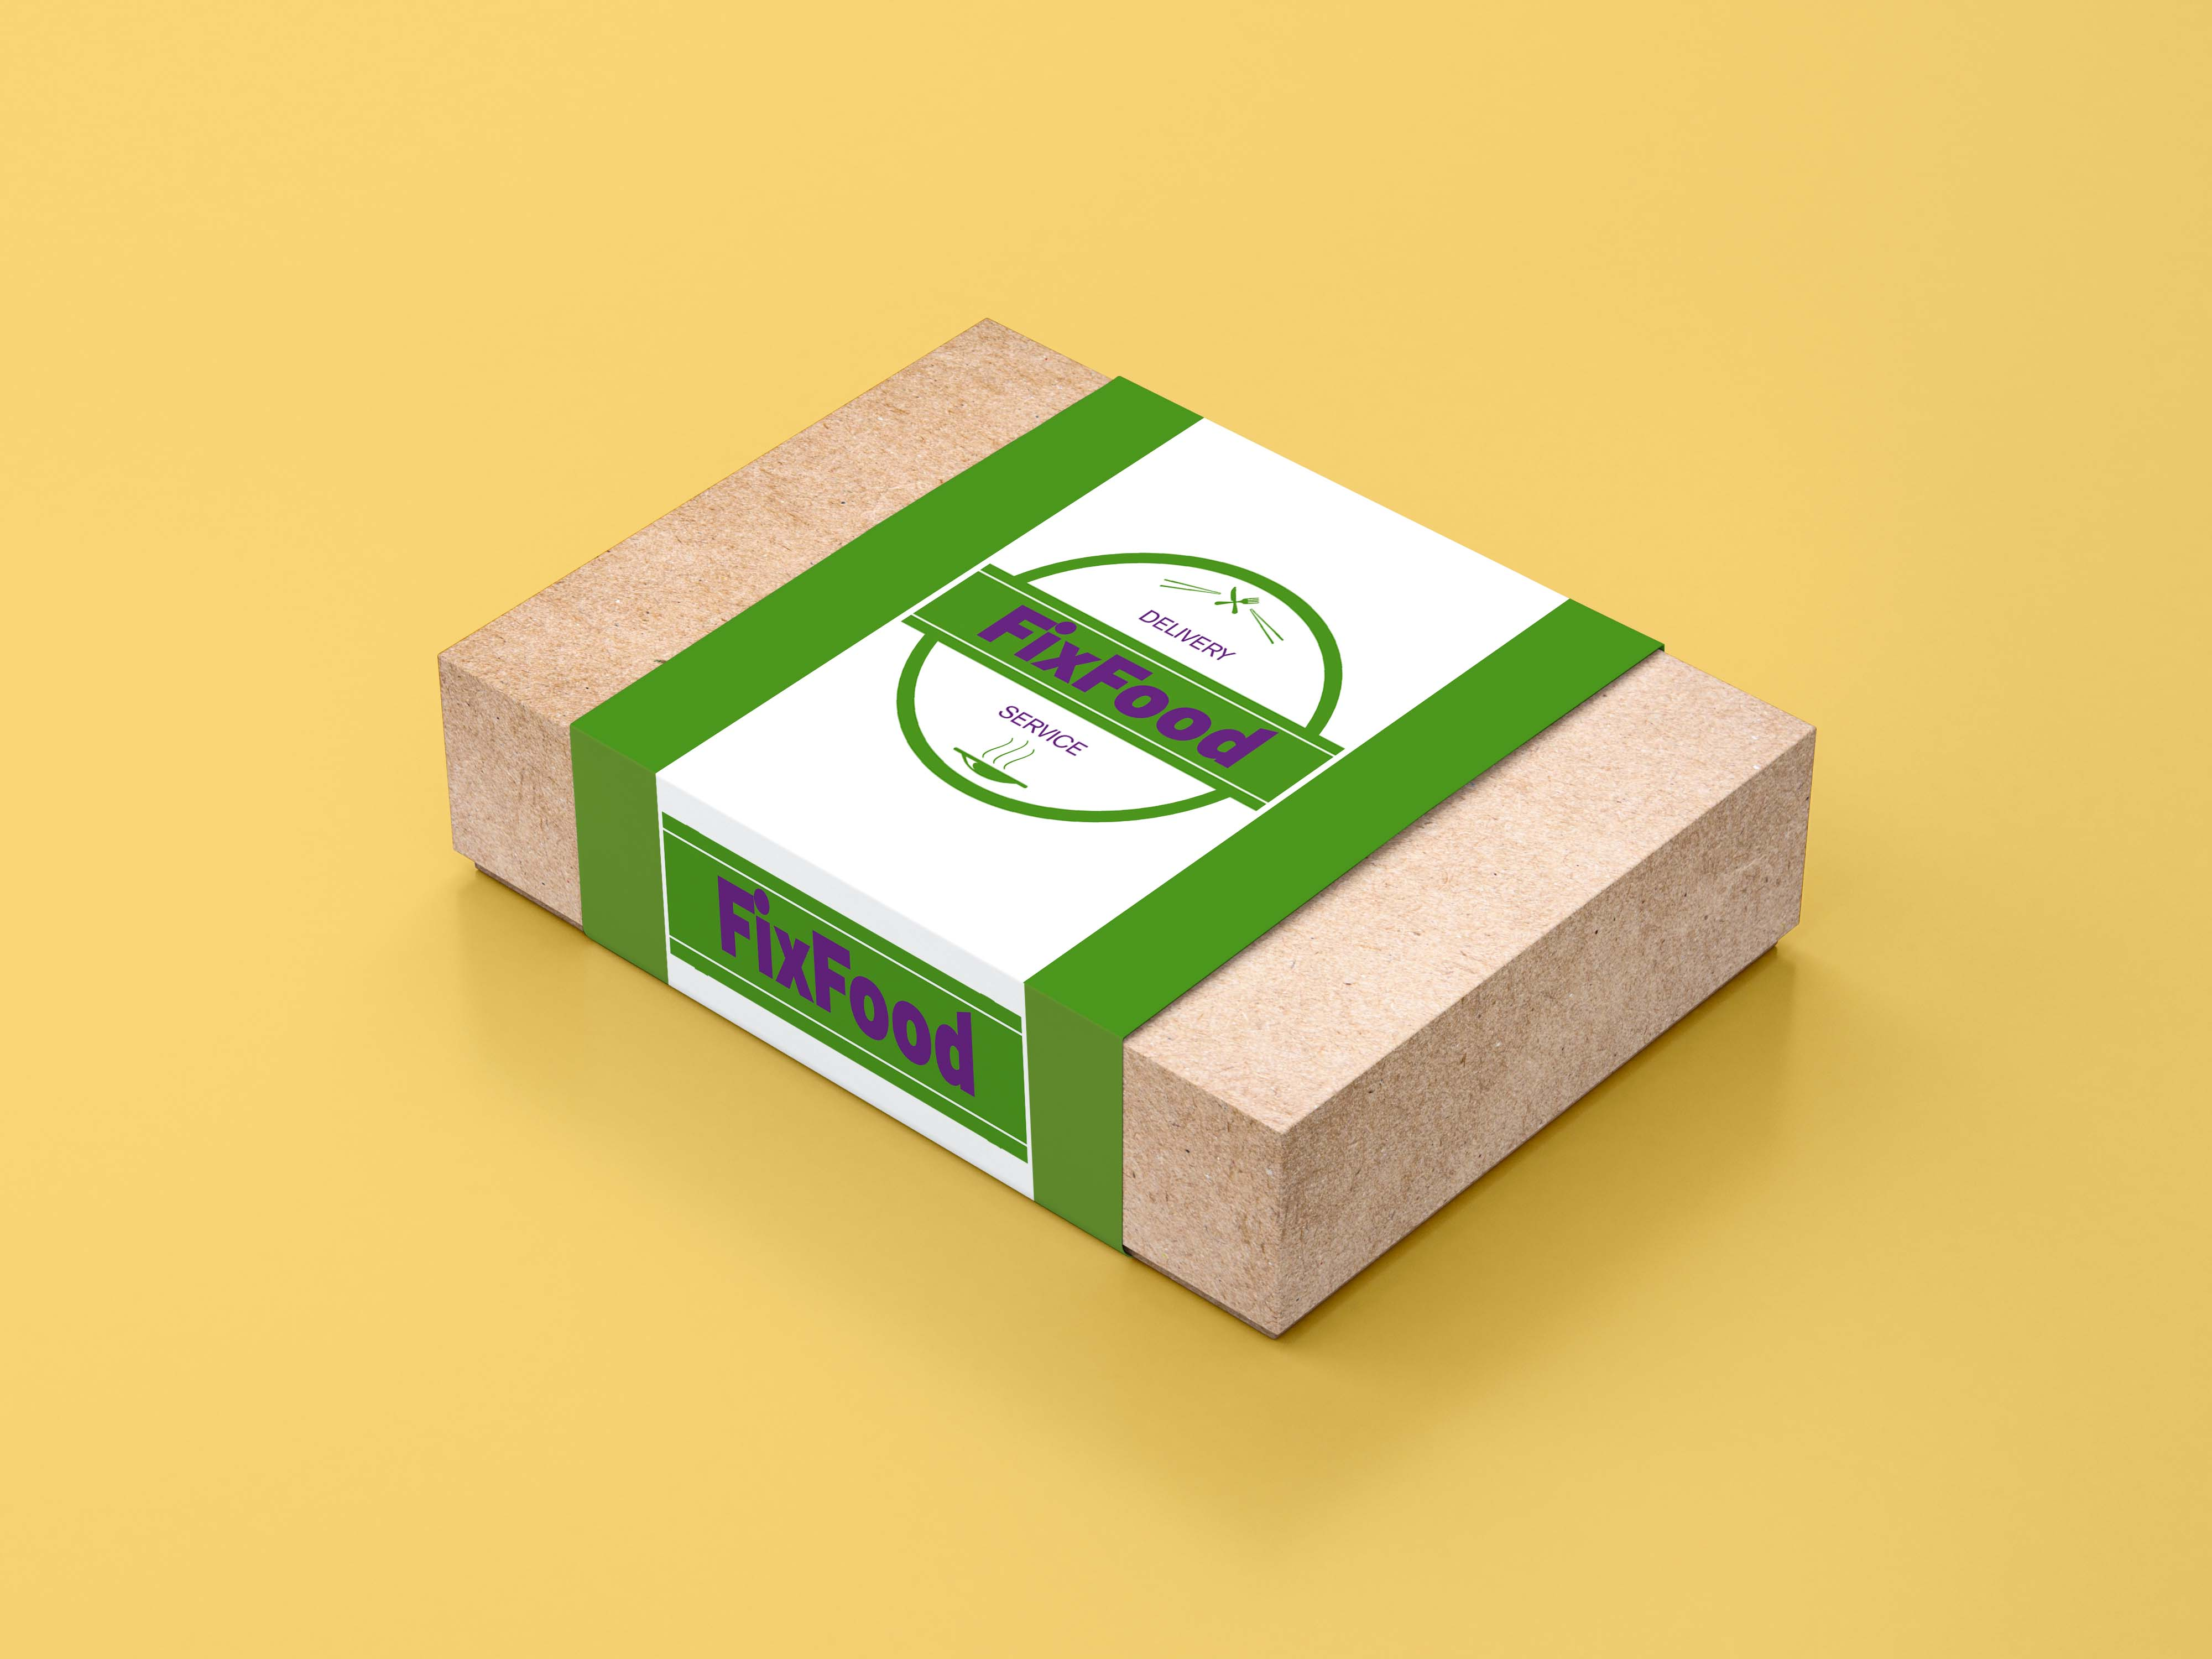 Логотип для доставки еды фото f_4505ecc2d0a477ba.jpg